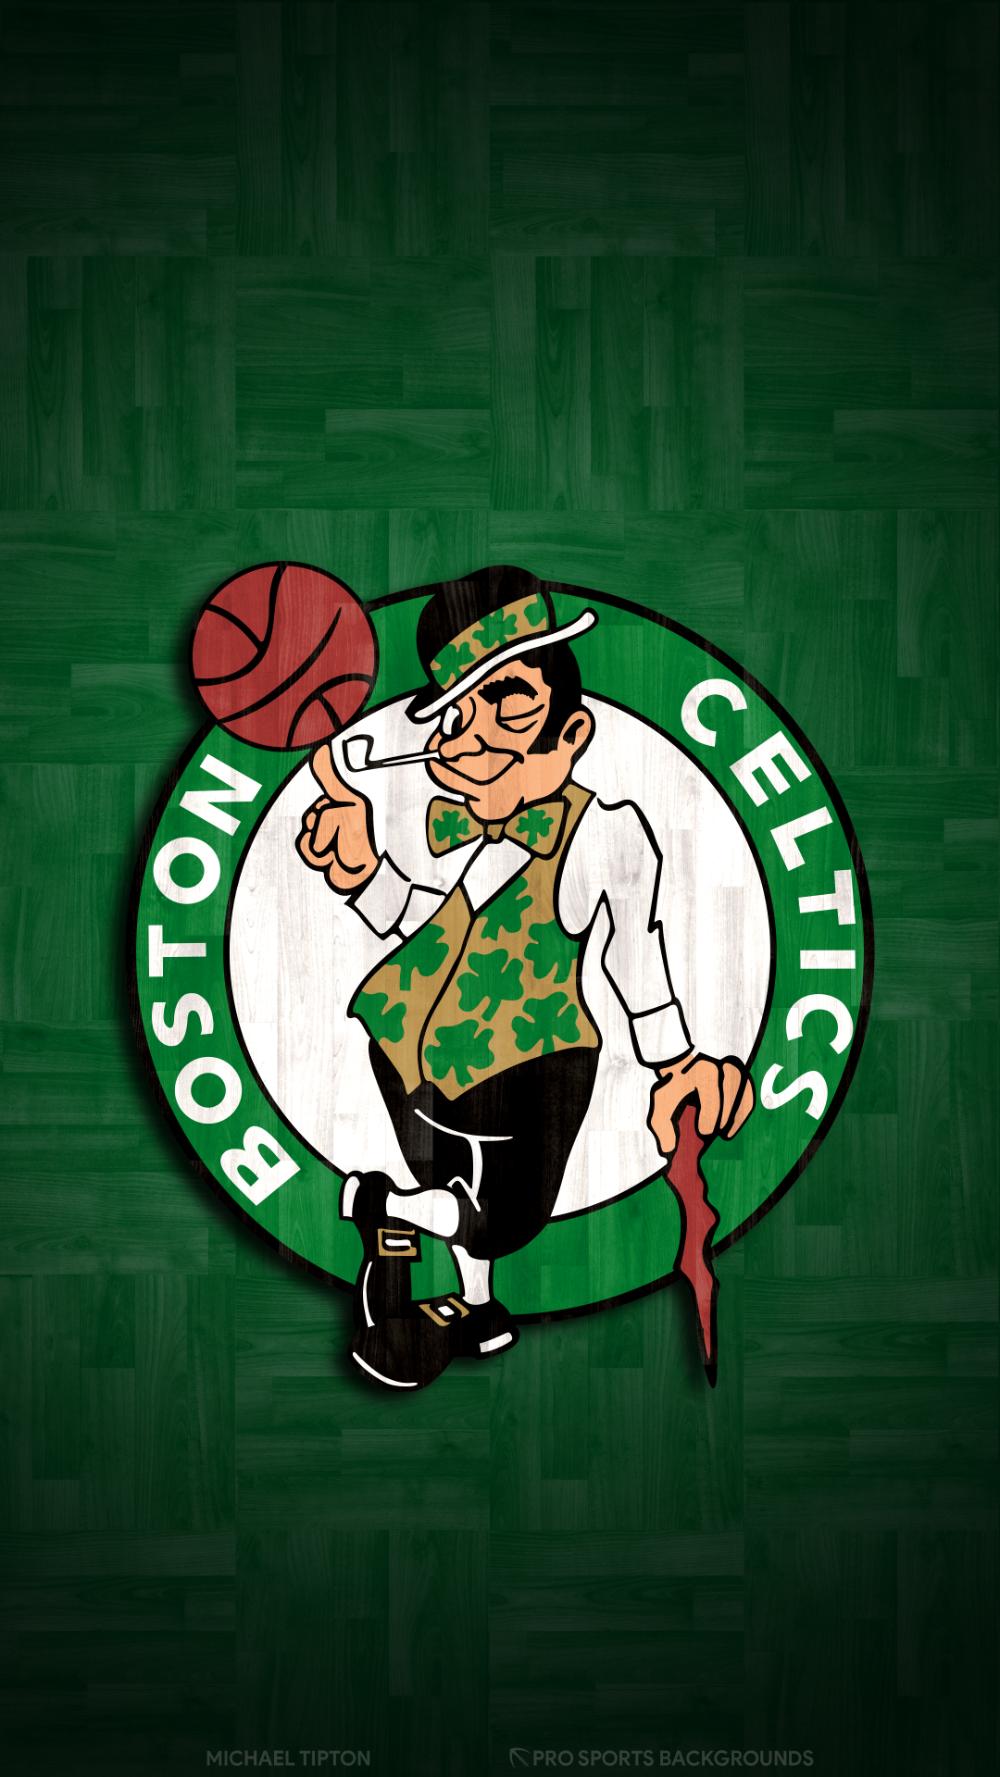 Boston Celtics Wallpapers Pro Sports Backgrounds Boston Celtics Wallpaper Boston Celtics Logo Boston Celtics